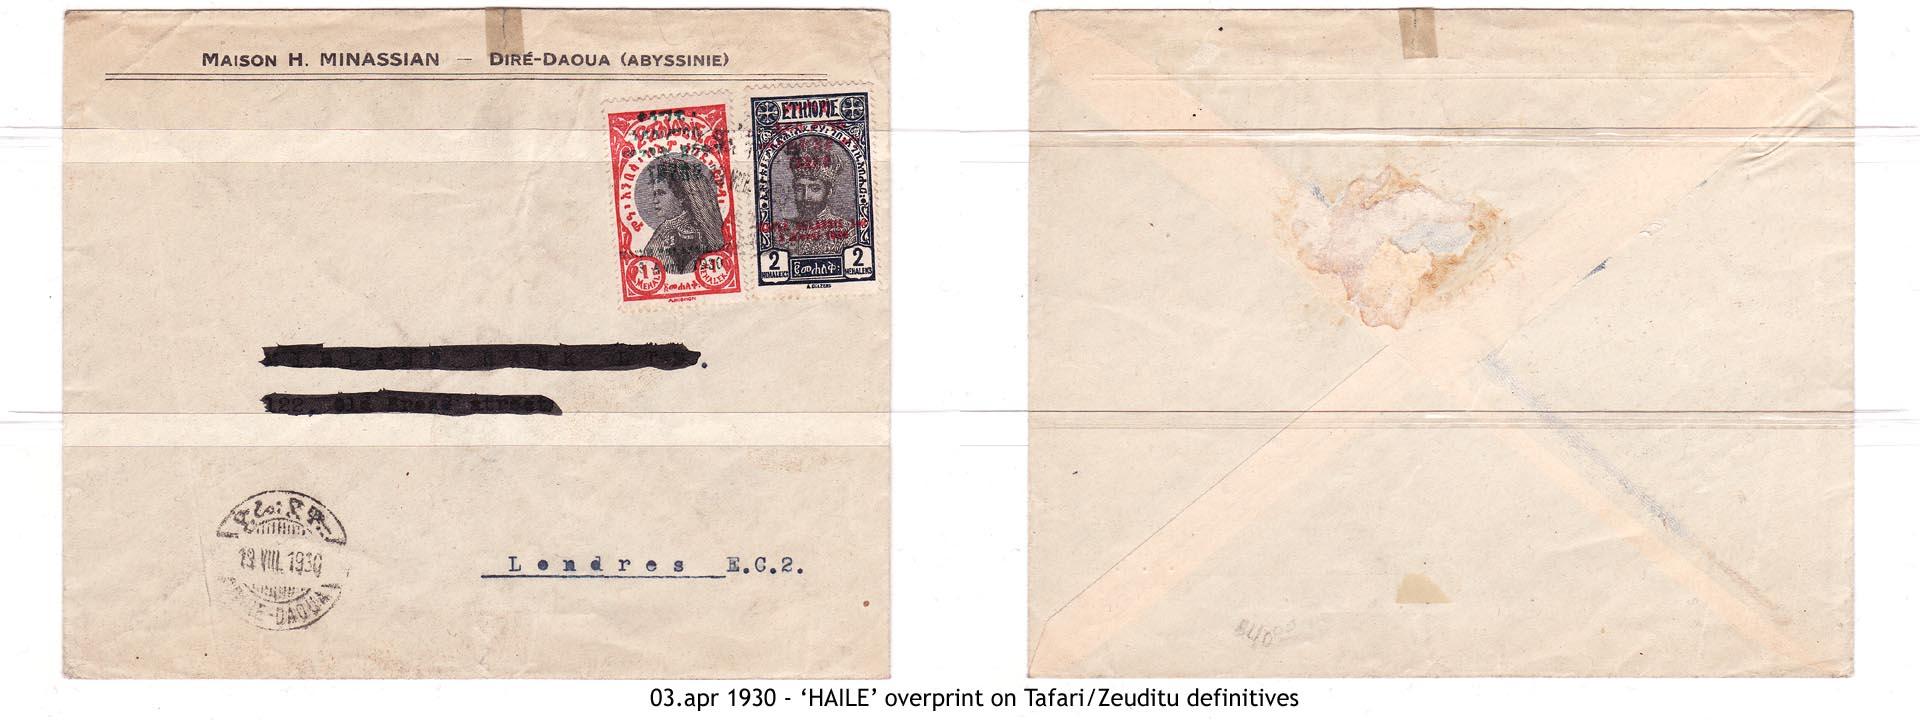 19300403 - 'HAILE' overprint on Tafari-Zeuditu definitives